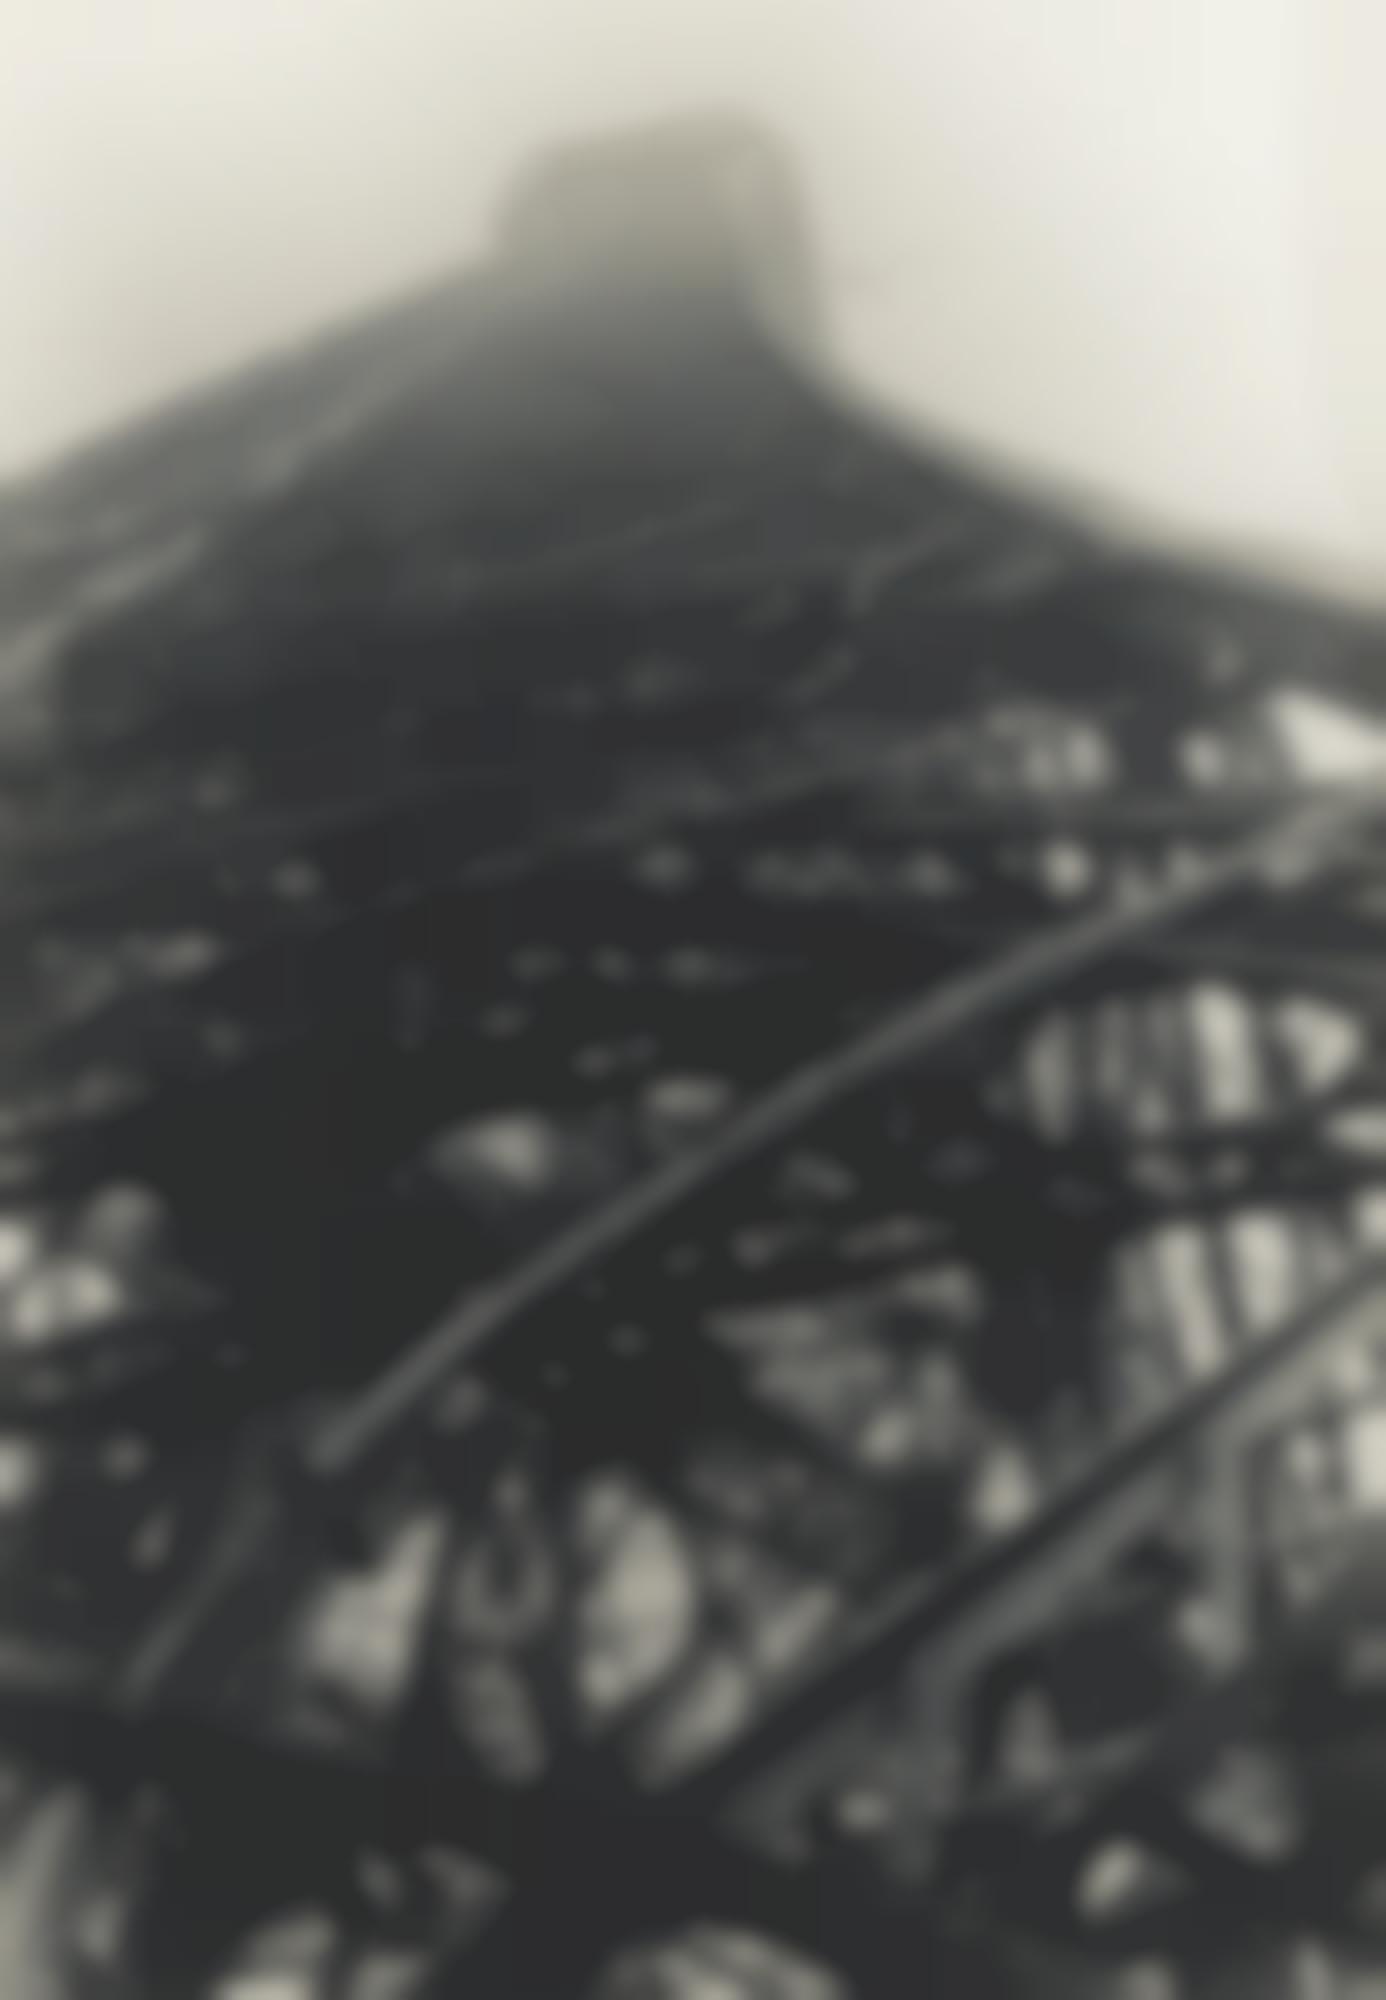 Germaine Krull-La Tour Eiffel Vers-1927